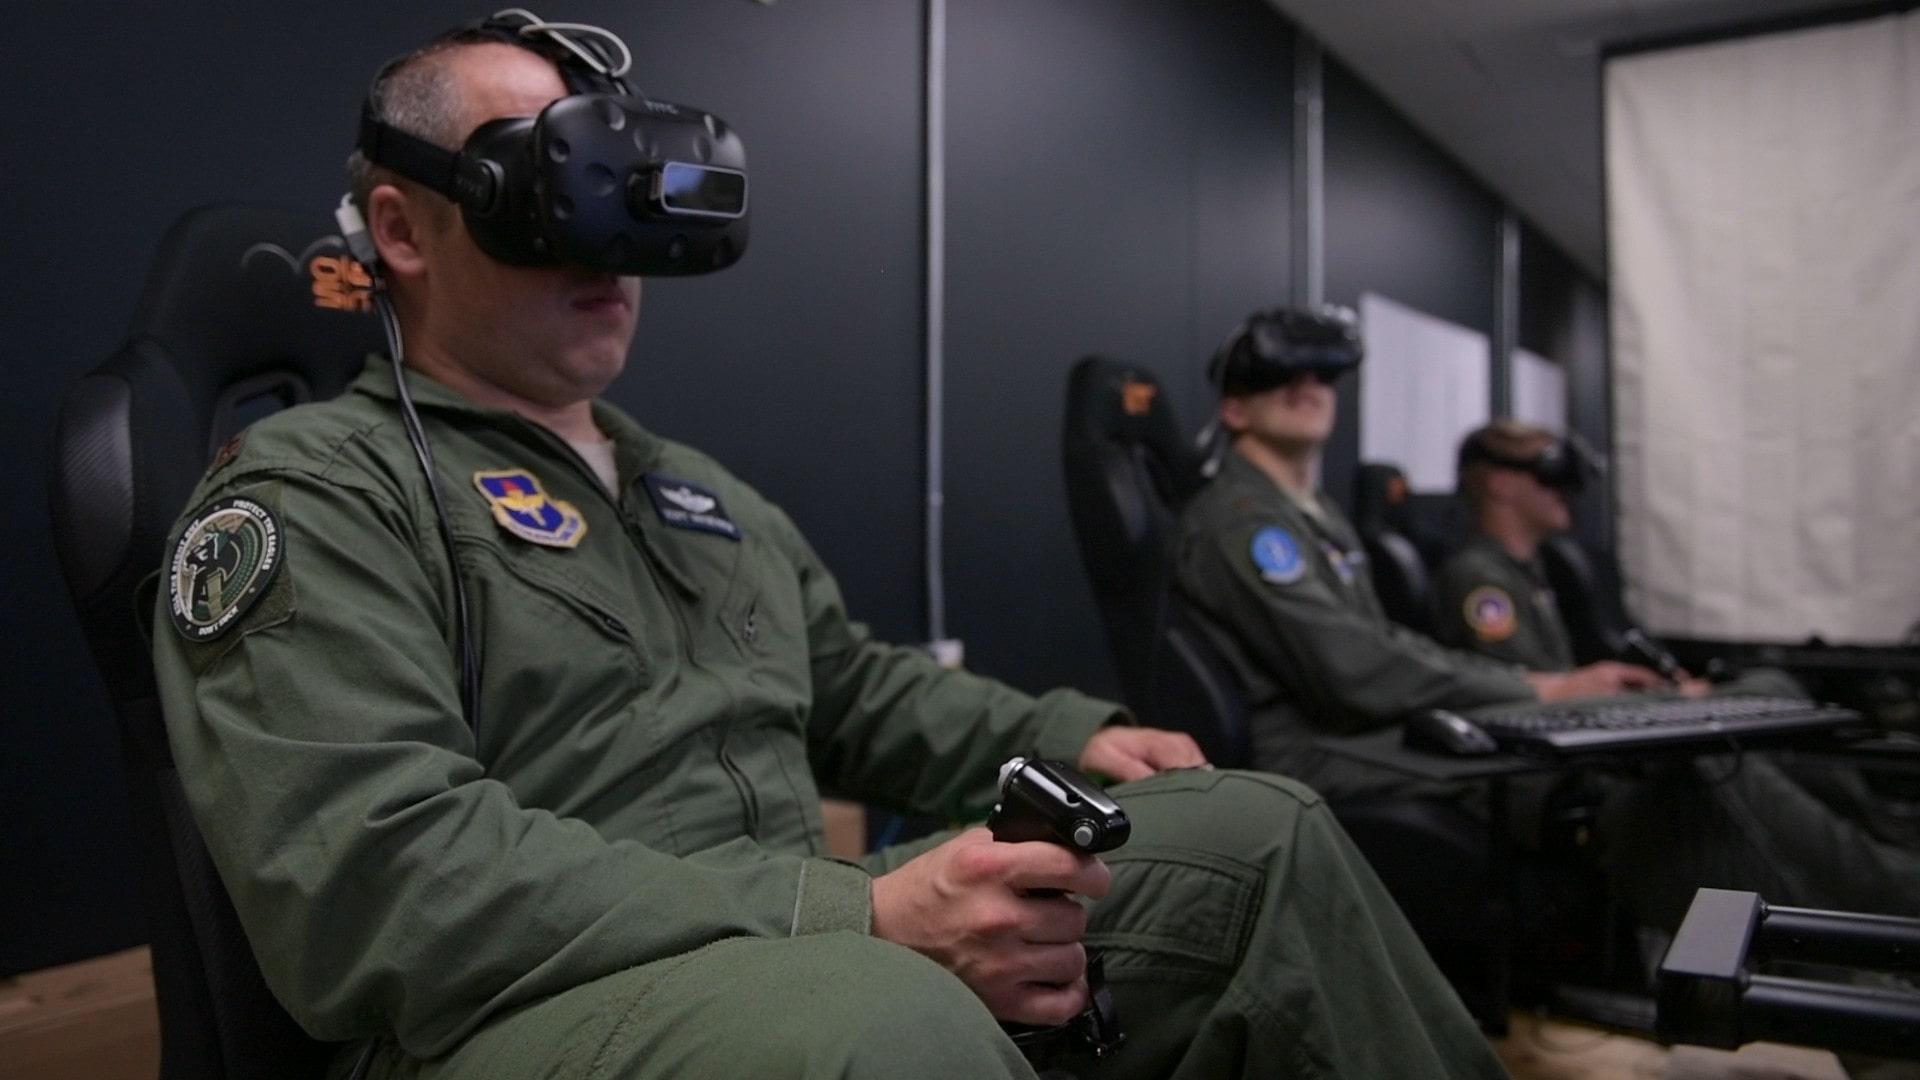 US Pilot using a virtual reality headset as a flight simulator